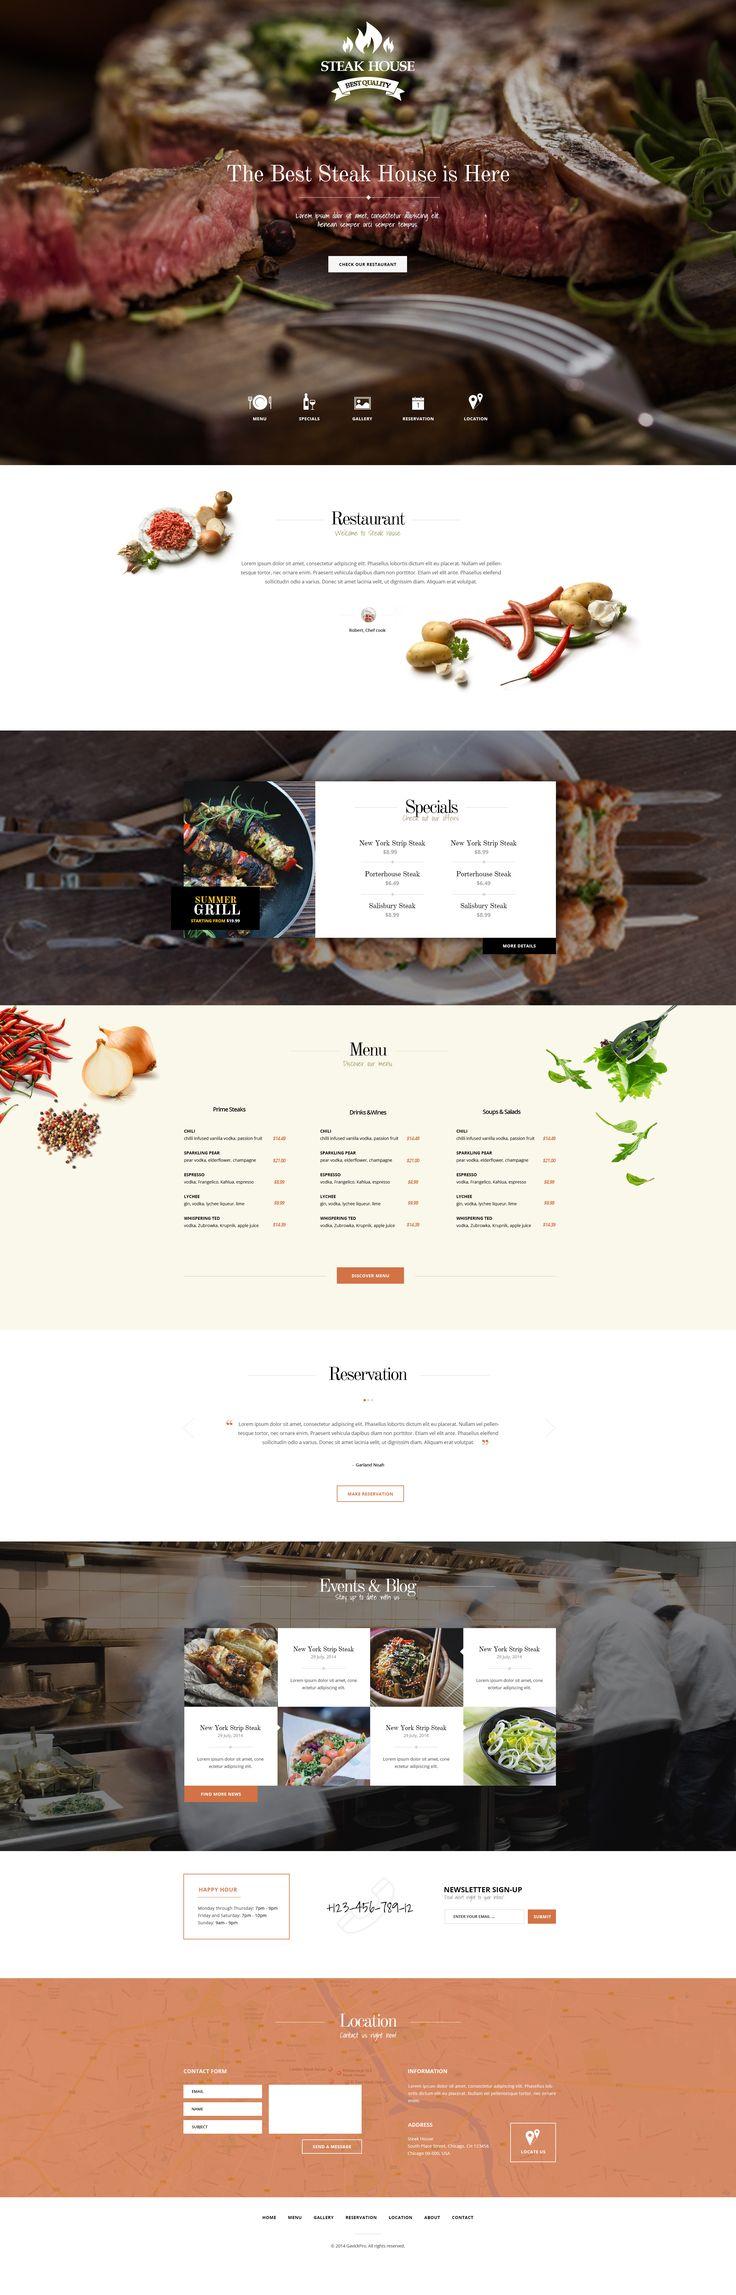 https://dribbble.com/shots/1669643-Steak-House-Food-WordPress-Theme/attachments/263283